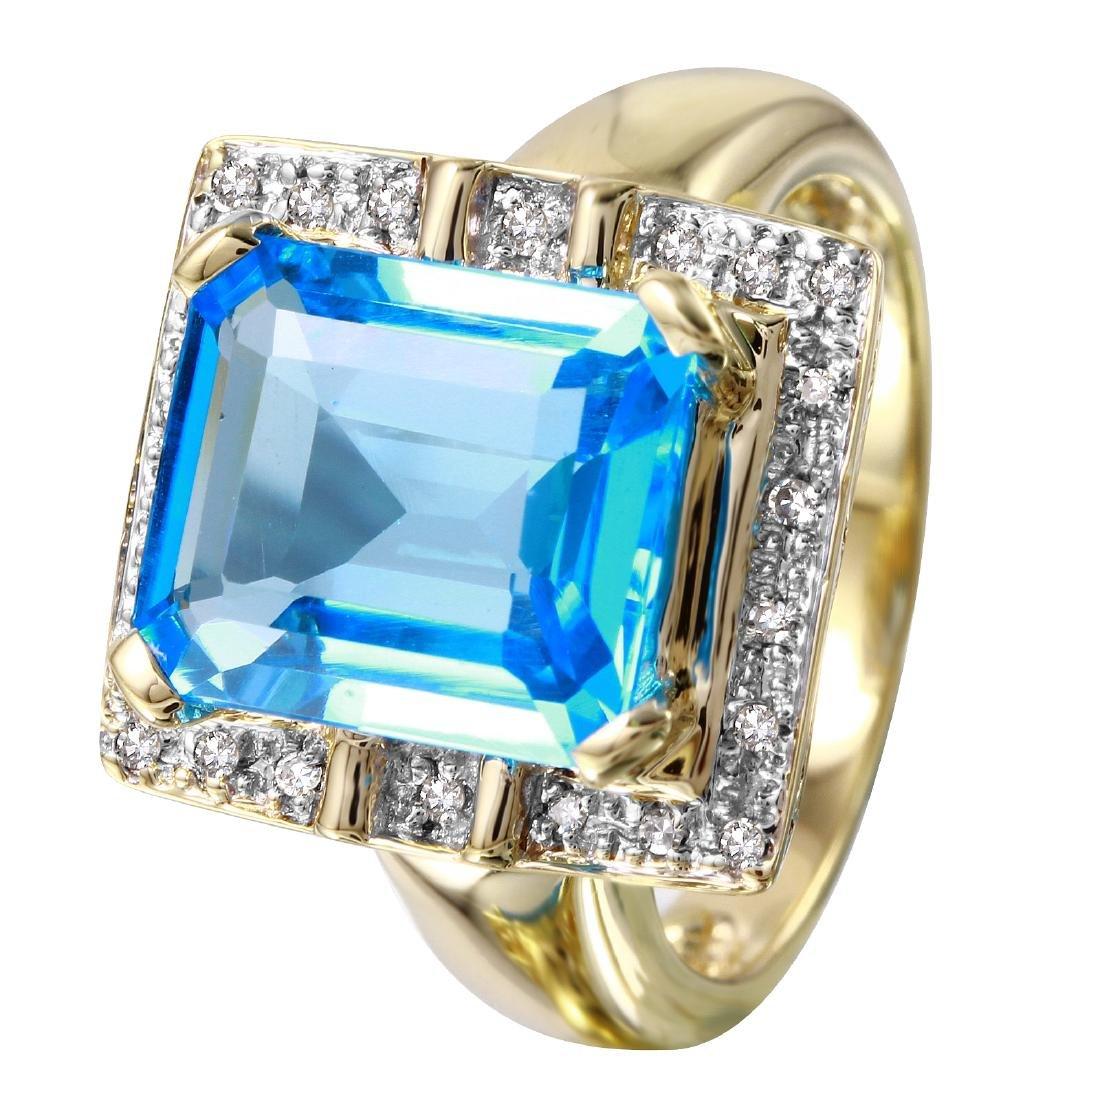 14KT Yellow Gold Topaz & Diamond Ring